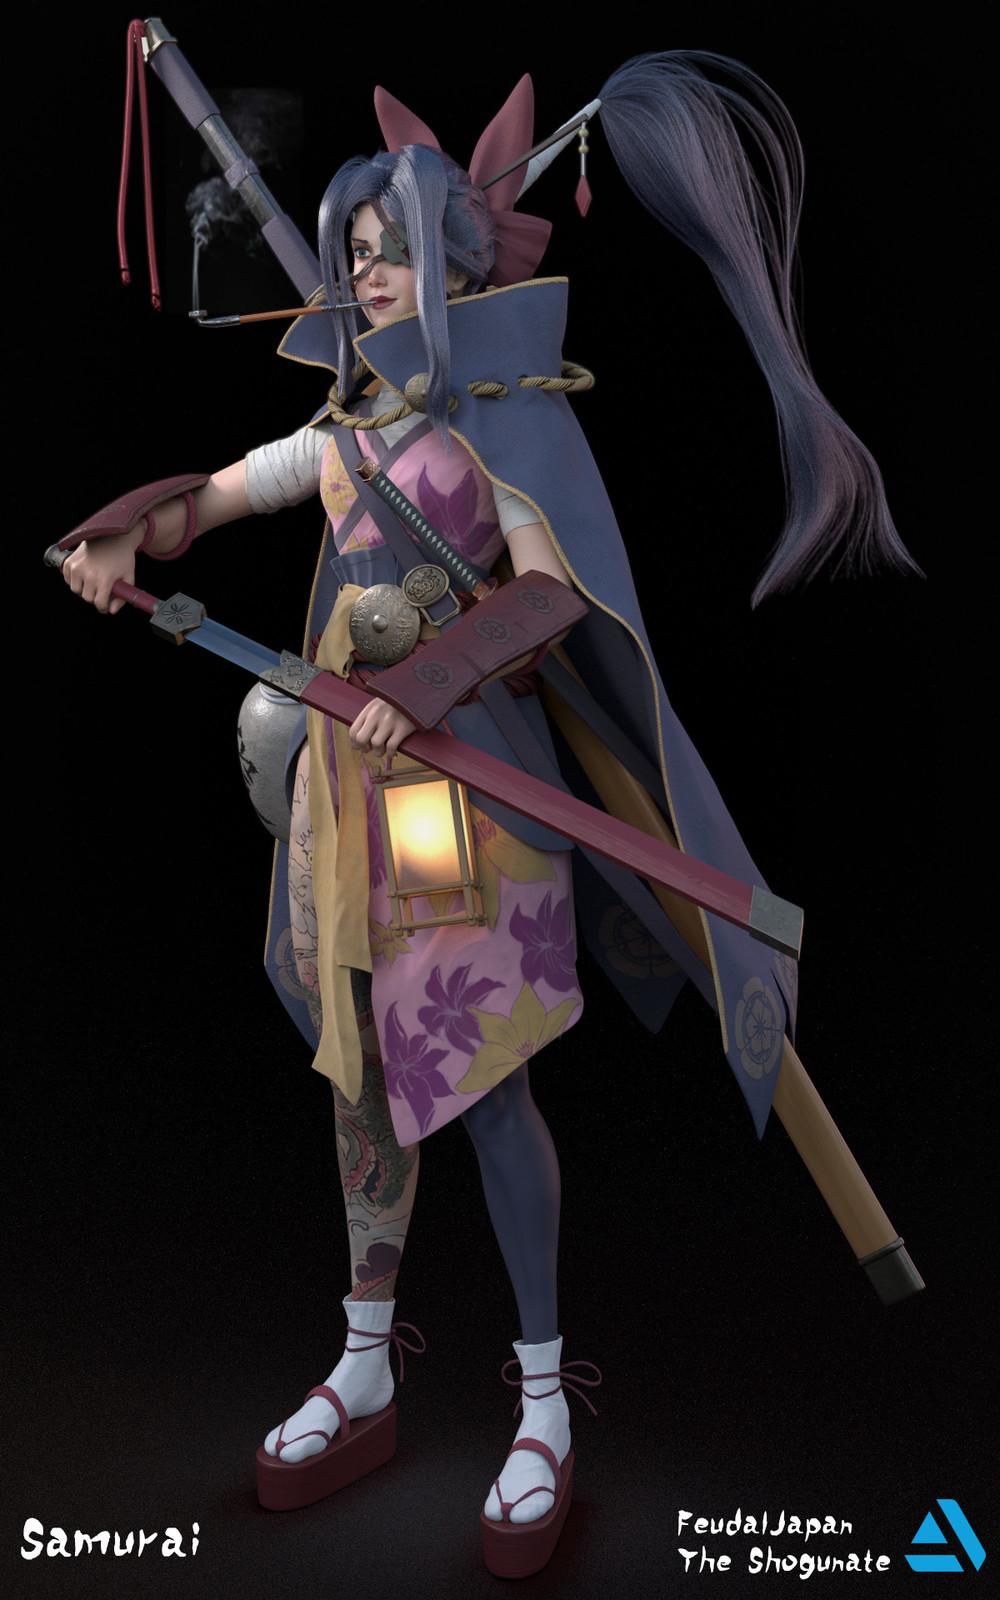 Samurai - Feudal Japan: The Shogunate